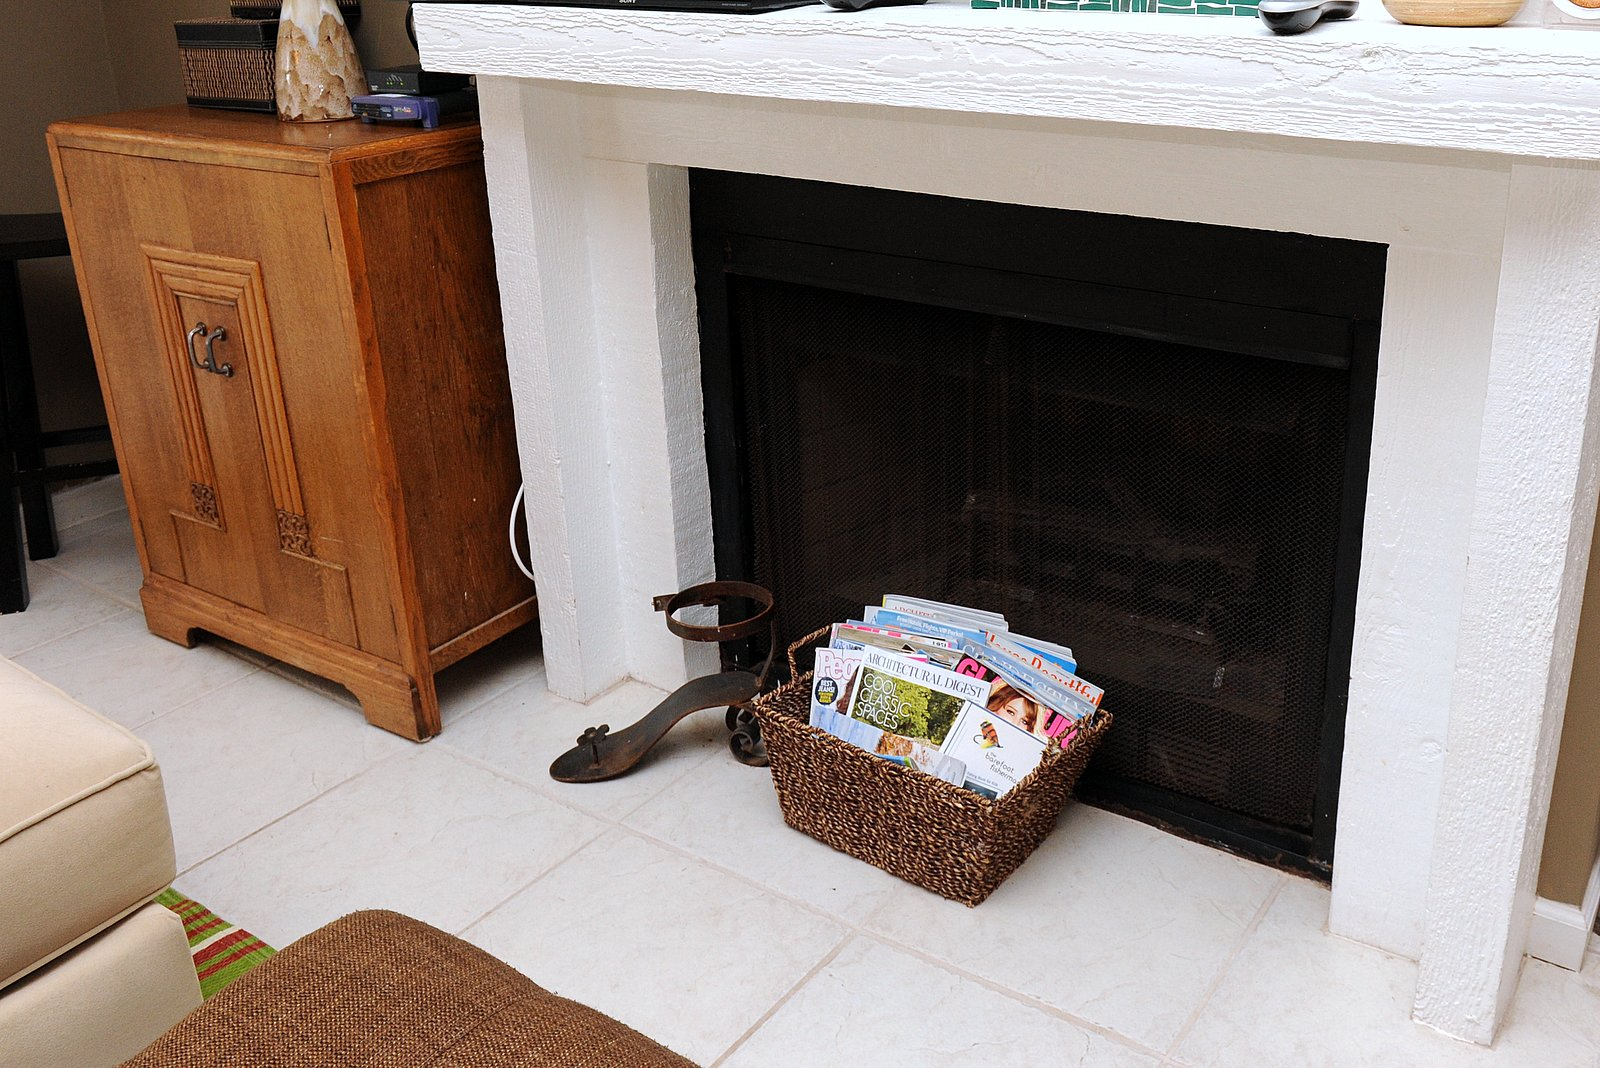 428 Linkside Condo rental in Sandestin Rentals ~ Cottages and Villas  in Destin Florida - #6